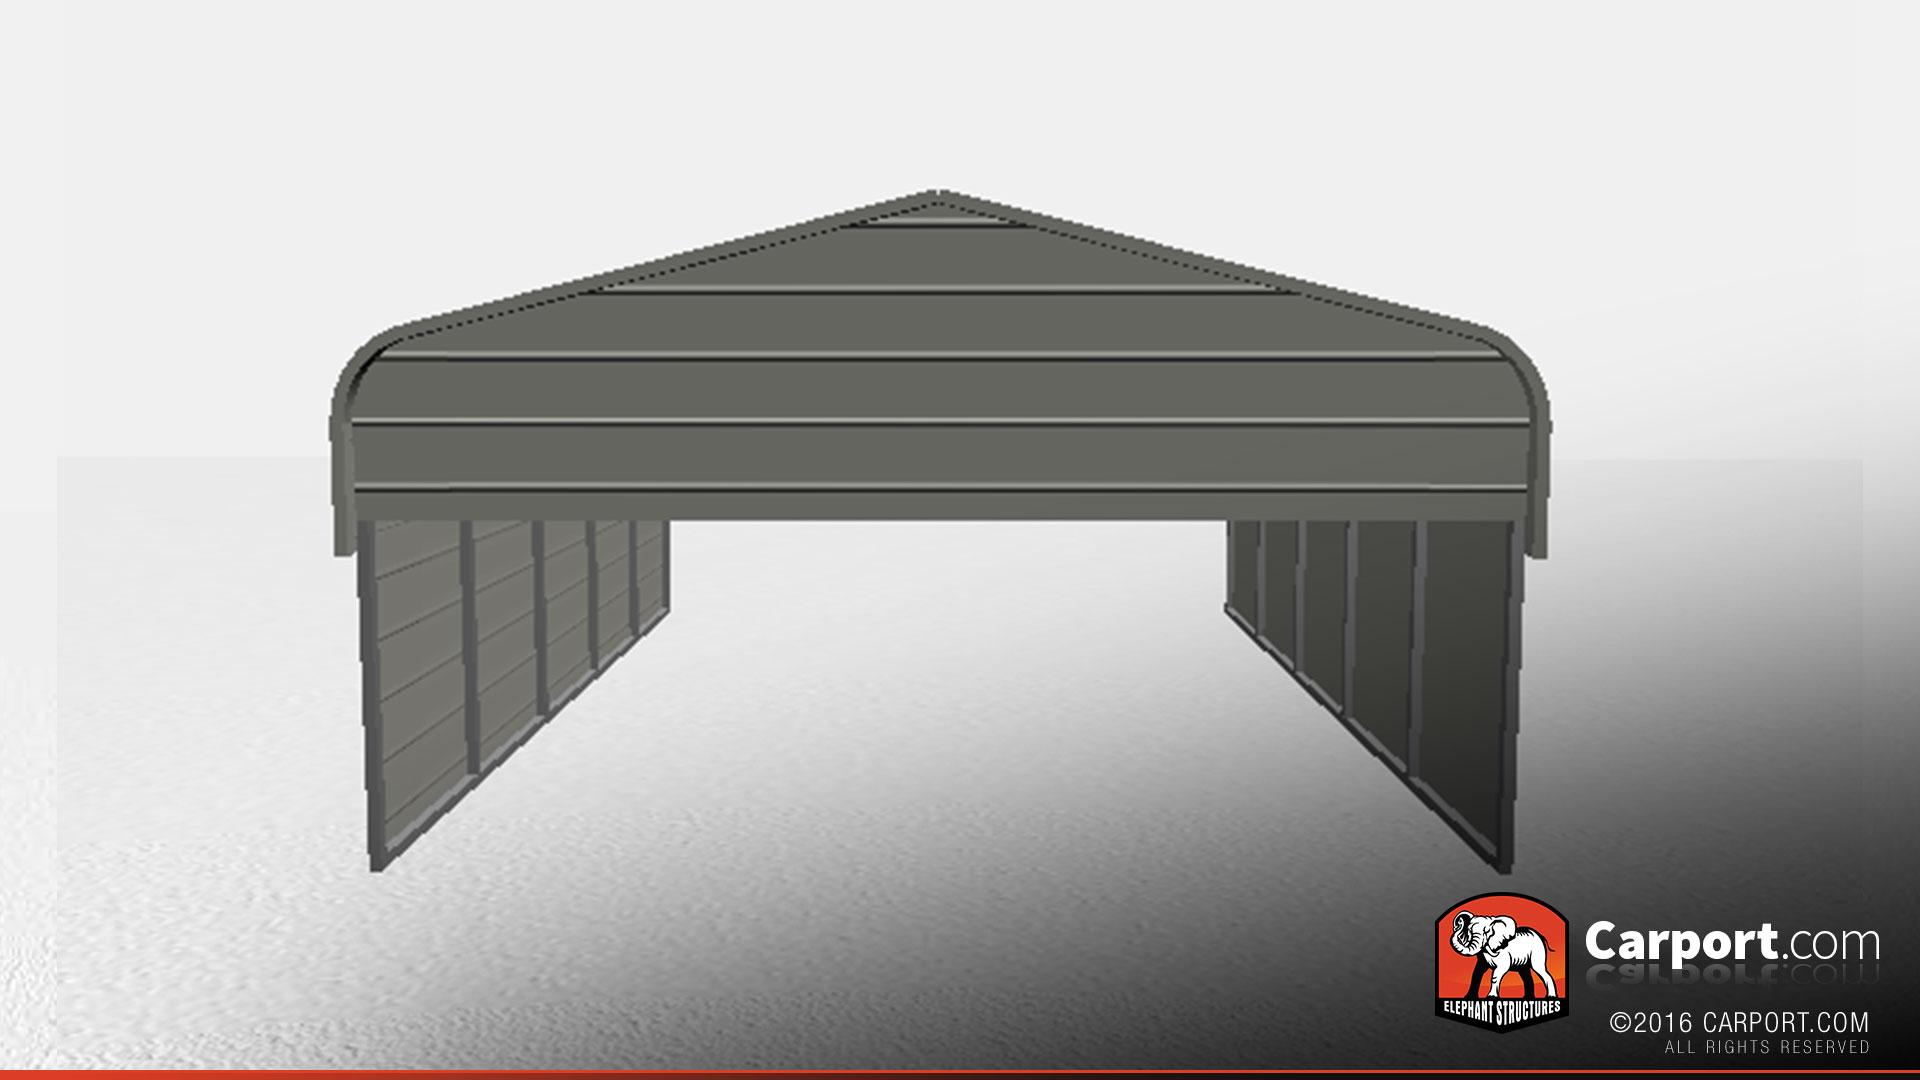 18 21 Carport : Top quality two car metal carport